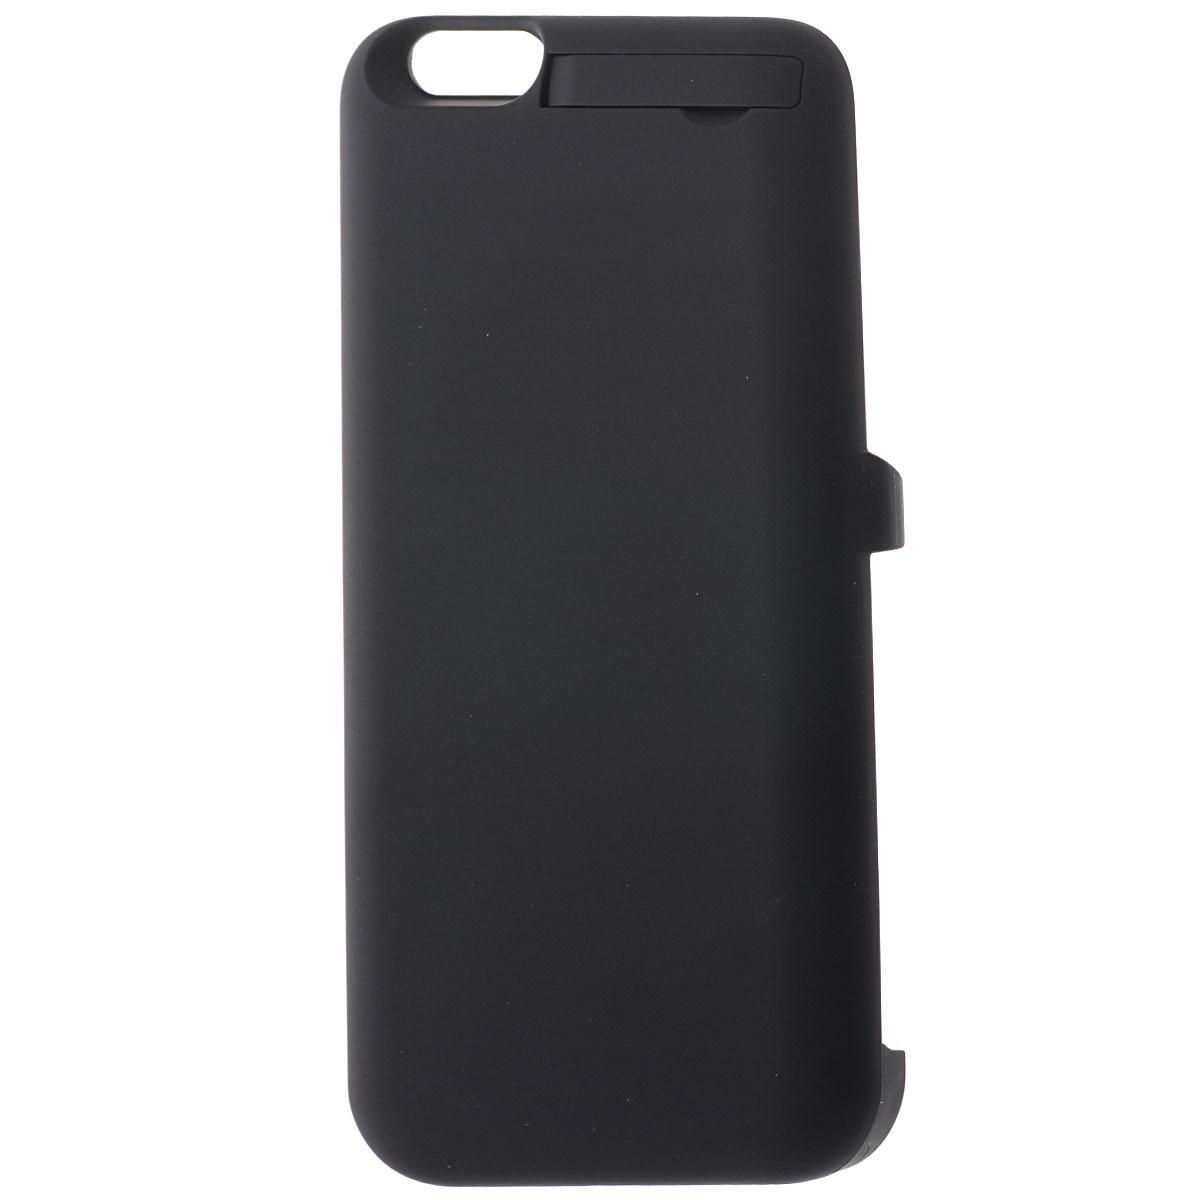 Фото - EXEQ HelpinG-iC08 чехол-аккумулятор для iPhone 6, Black (3300 мАч, клип-кейс) аккумулятор